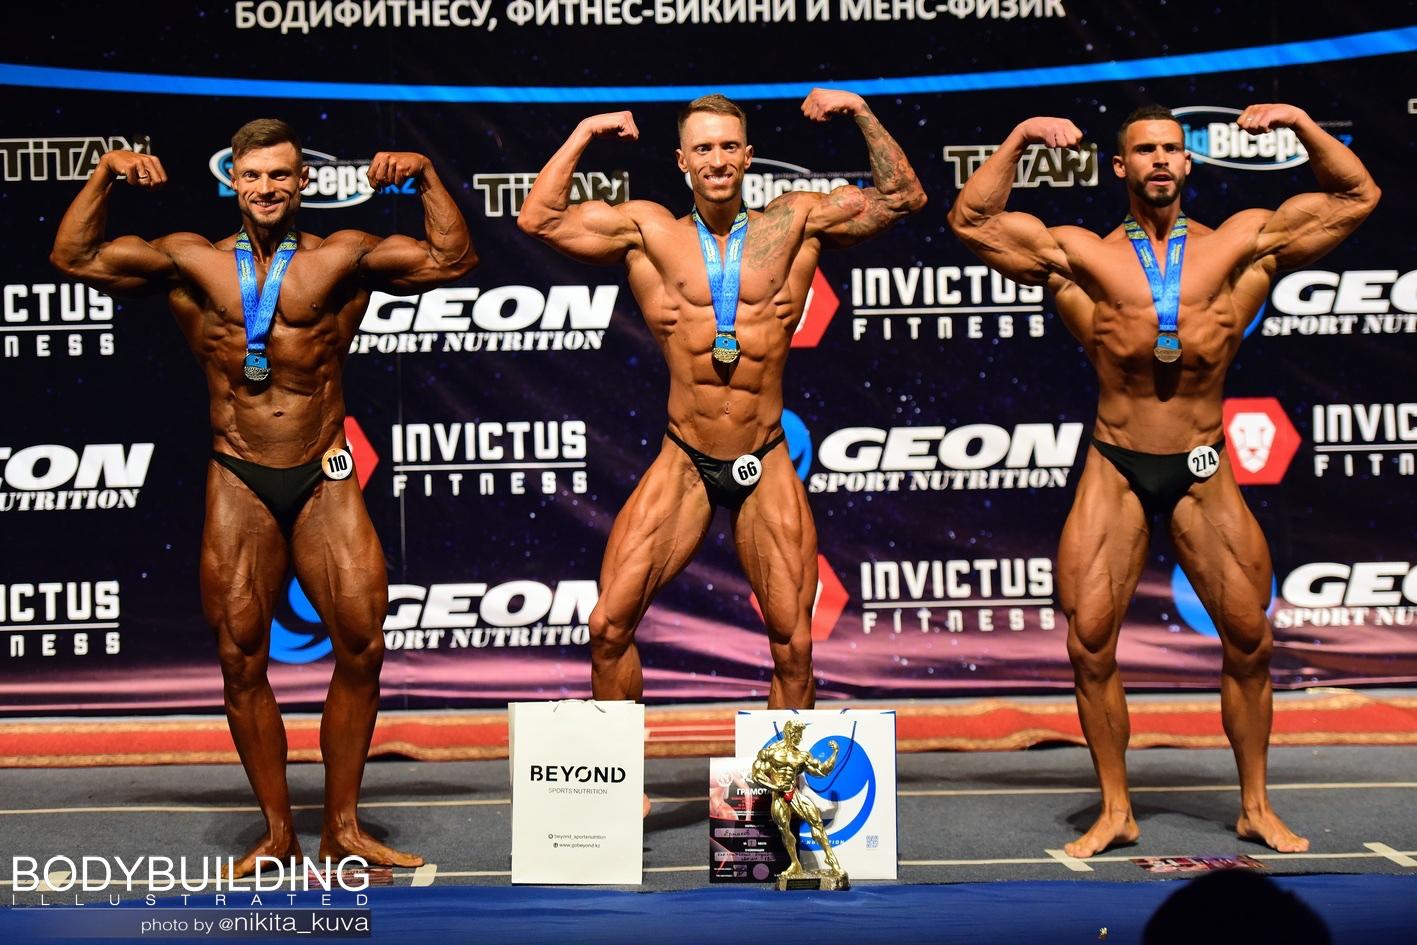 Bodybuilding Illustrated Kazakhstan